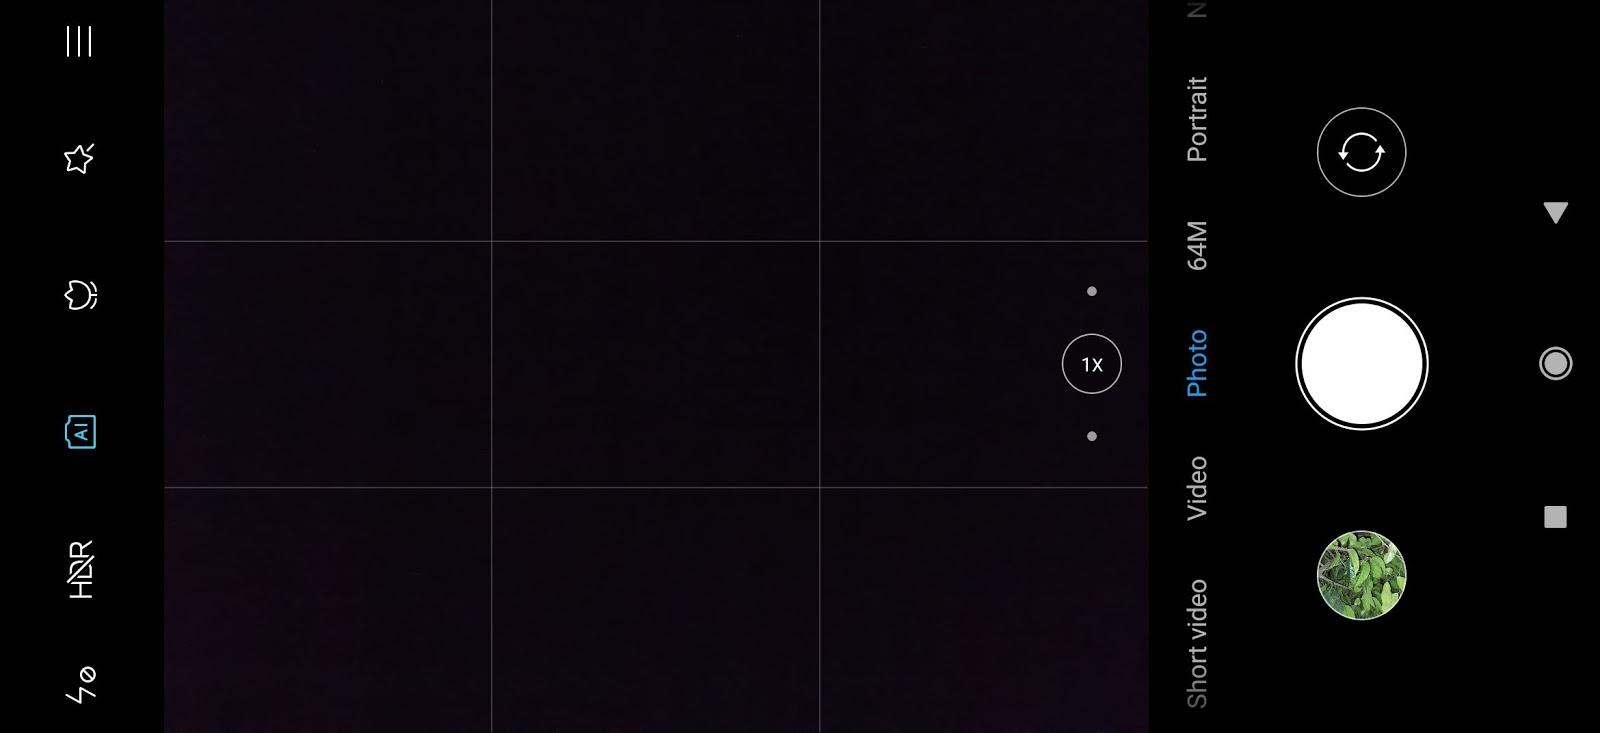 Review Kamera Xiaomi Redmi Note 8 Pro